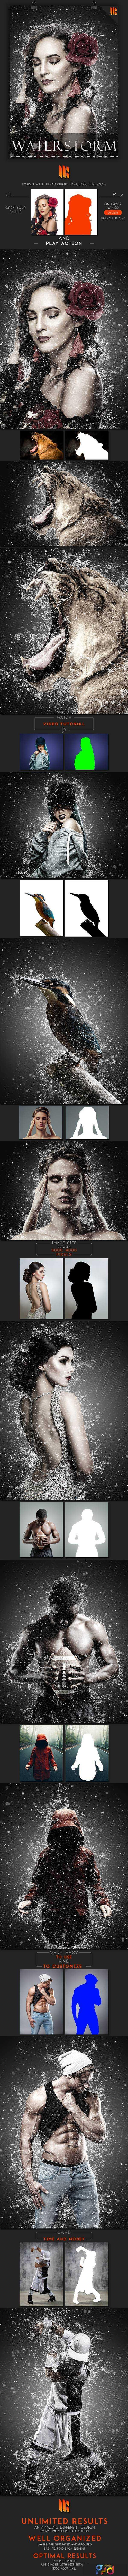 1805268 WaterStorm Photoshop Action 21687974 - FreePSDvn